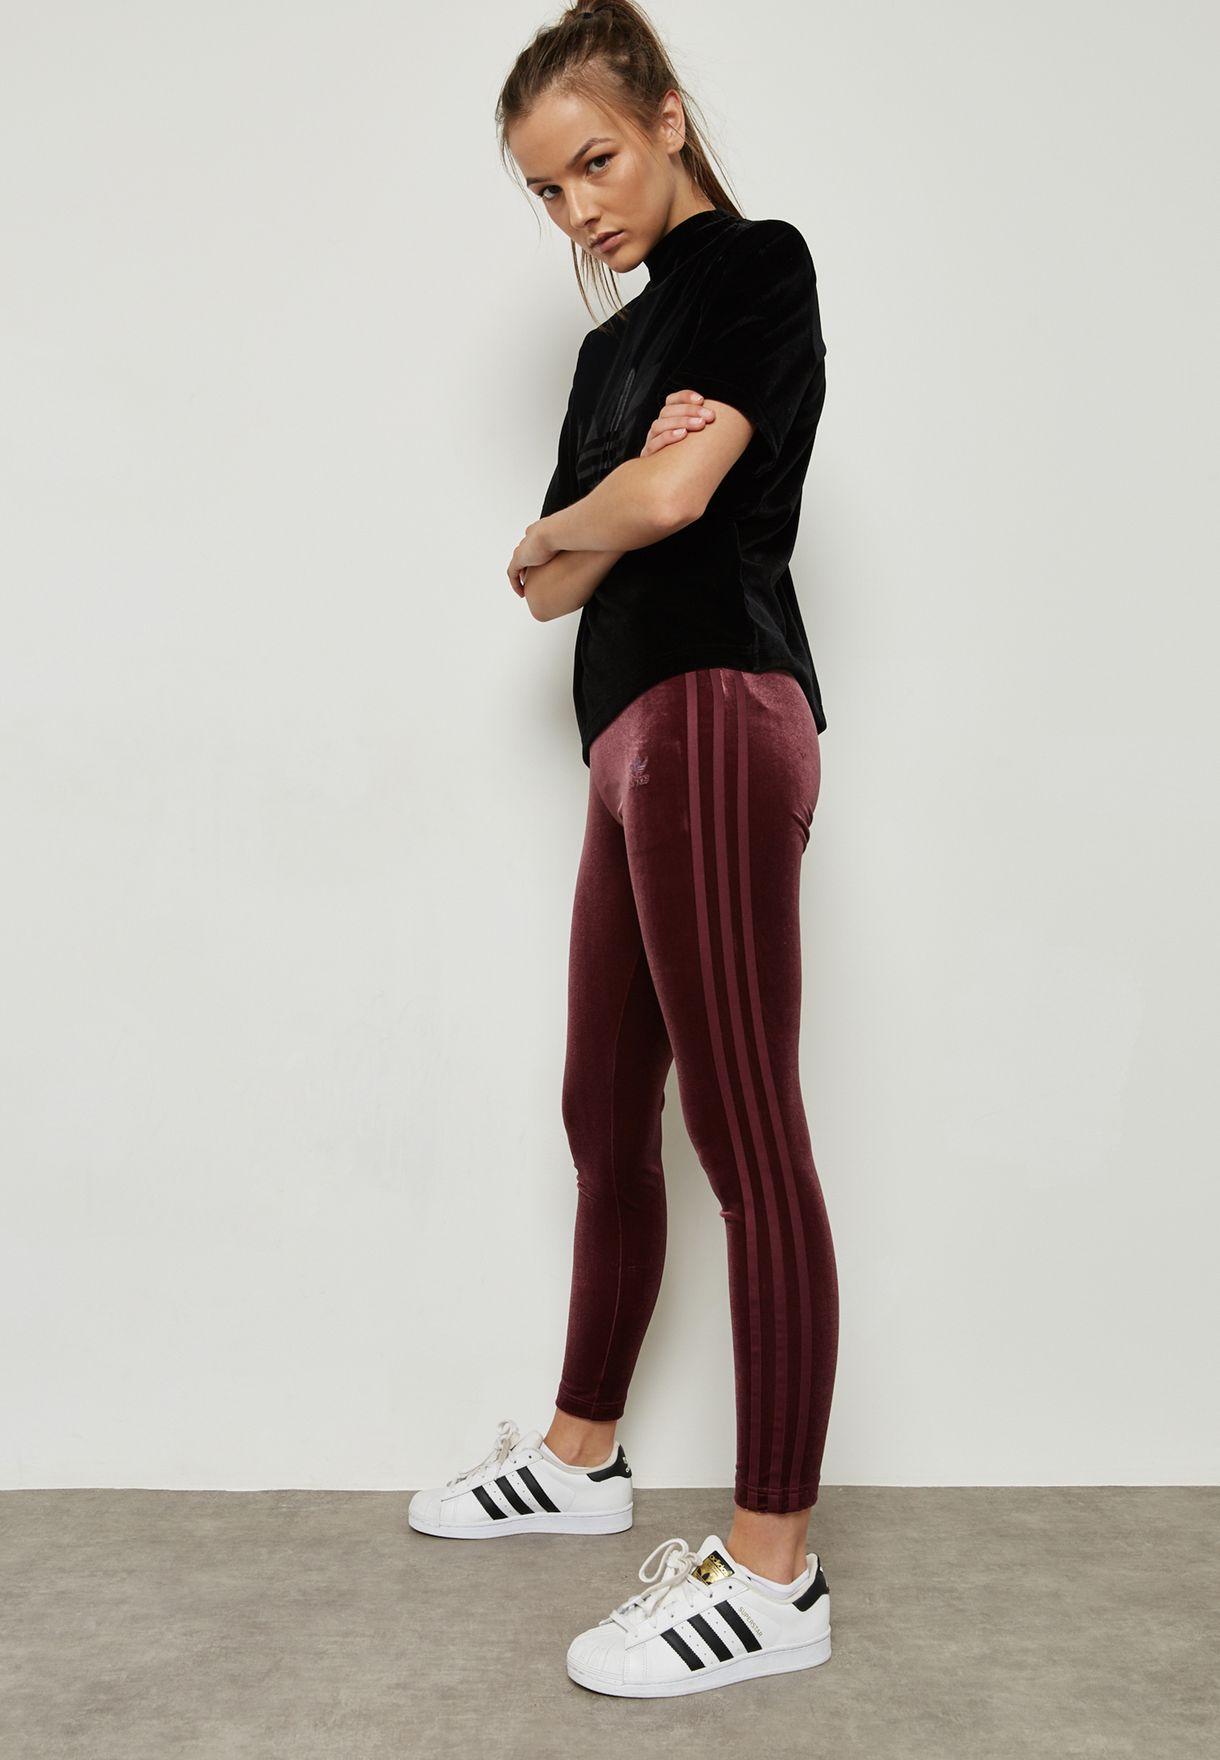 927791dedb86f8 Shop adidas Originals purple Velvet Vibes Leggings CW0276 for Women ...